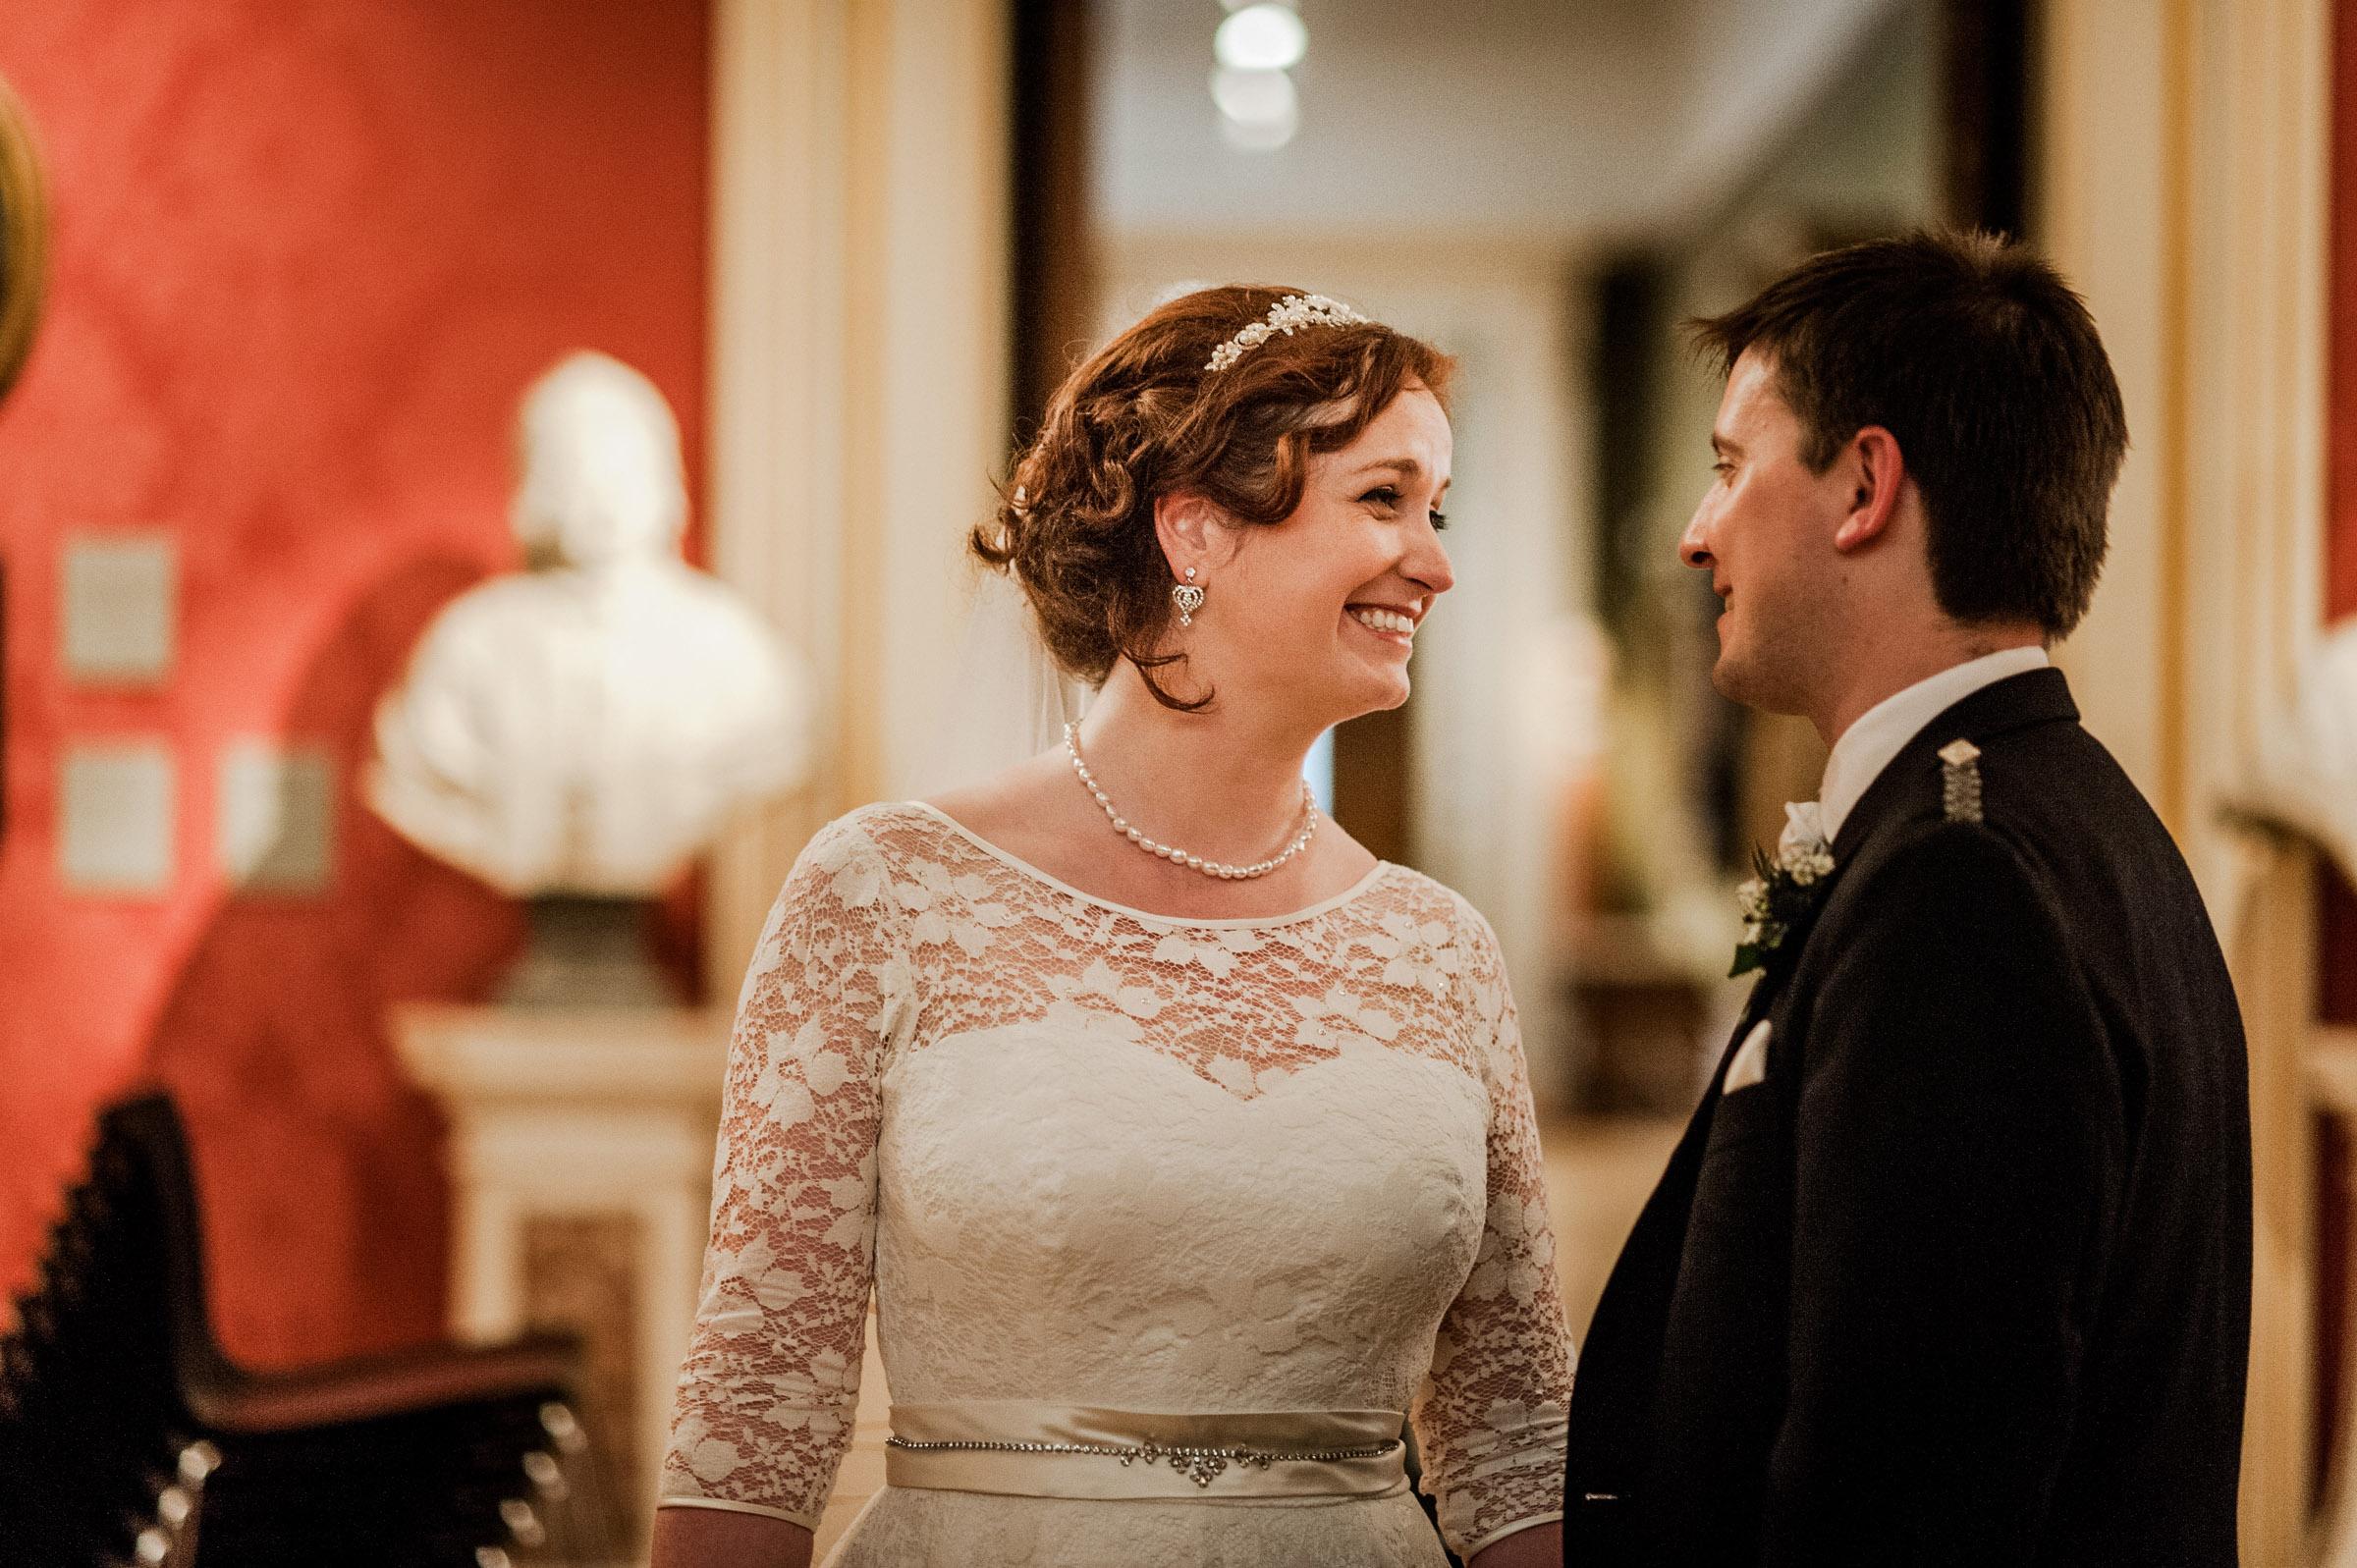 Ashmolean-Museum-Wedding-Pictures-0040.jpg